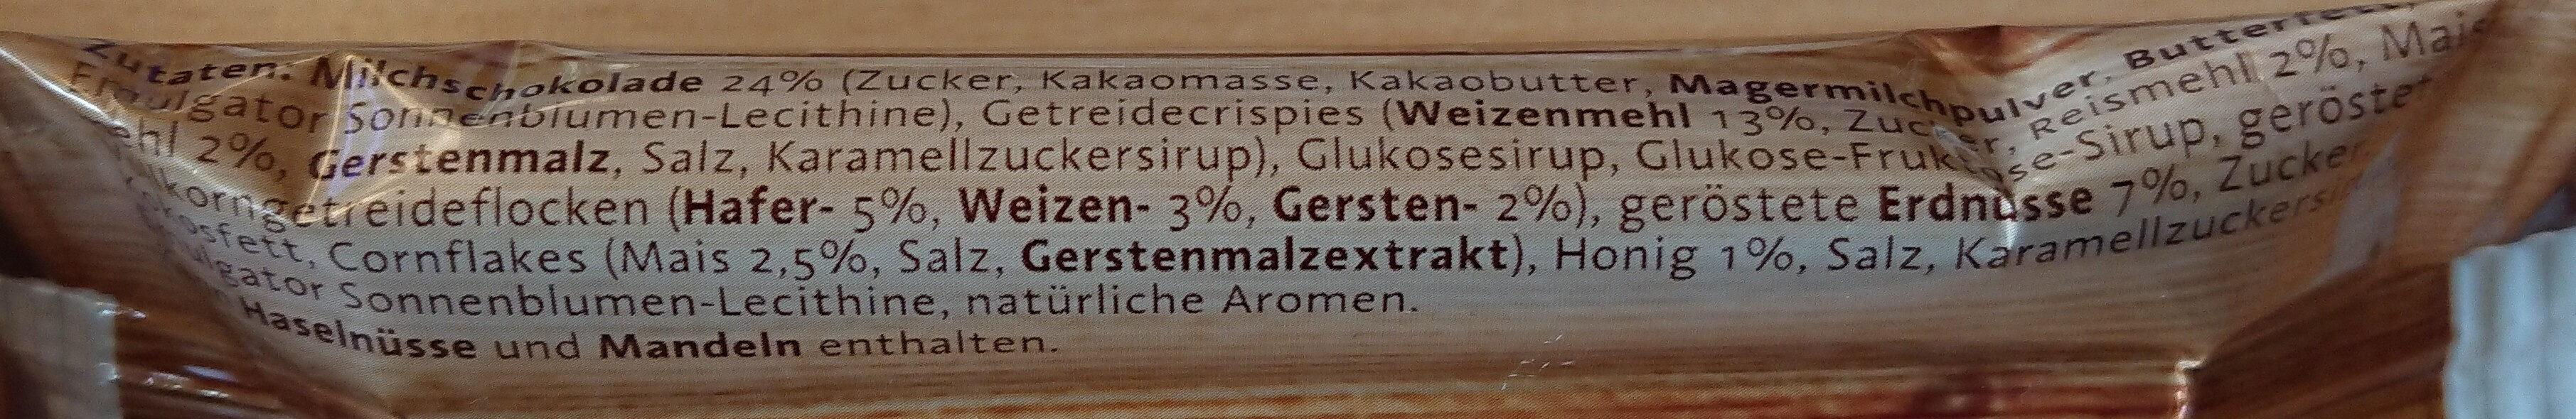 Corny Schoko - Ingredienti - de